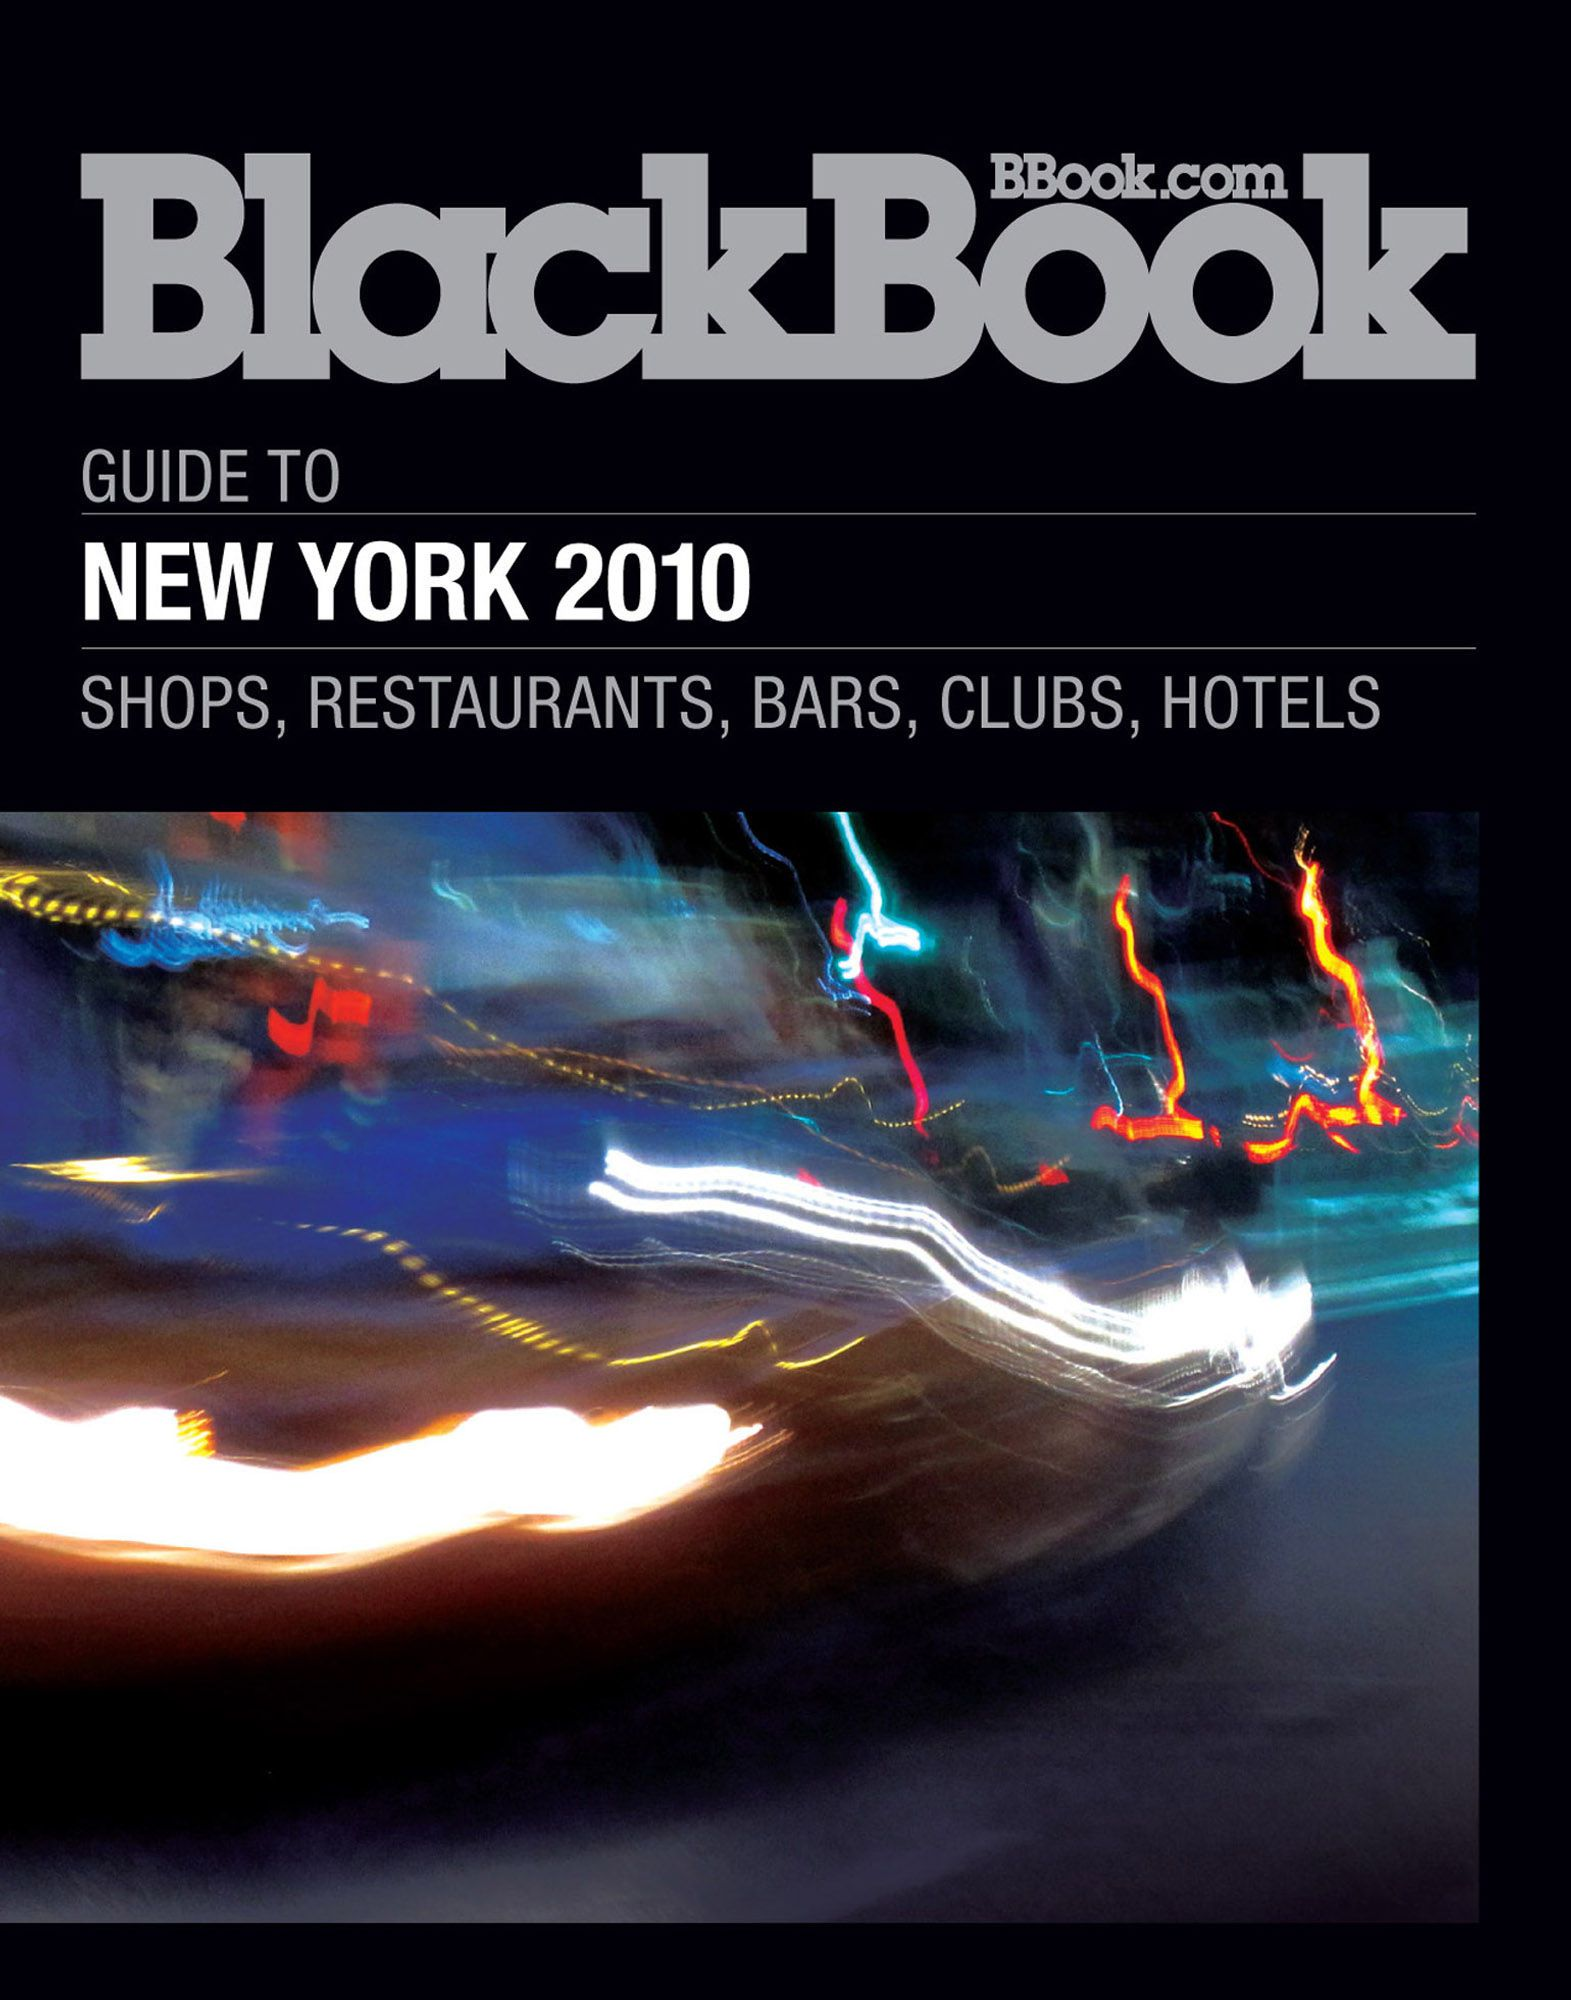 BLACKBOOK GUIDE LIFESTYLE  Item 56000696 1